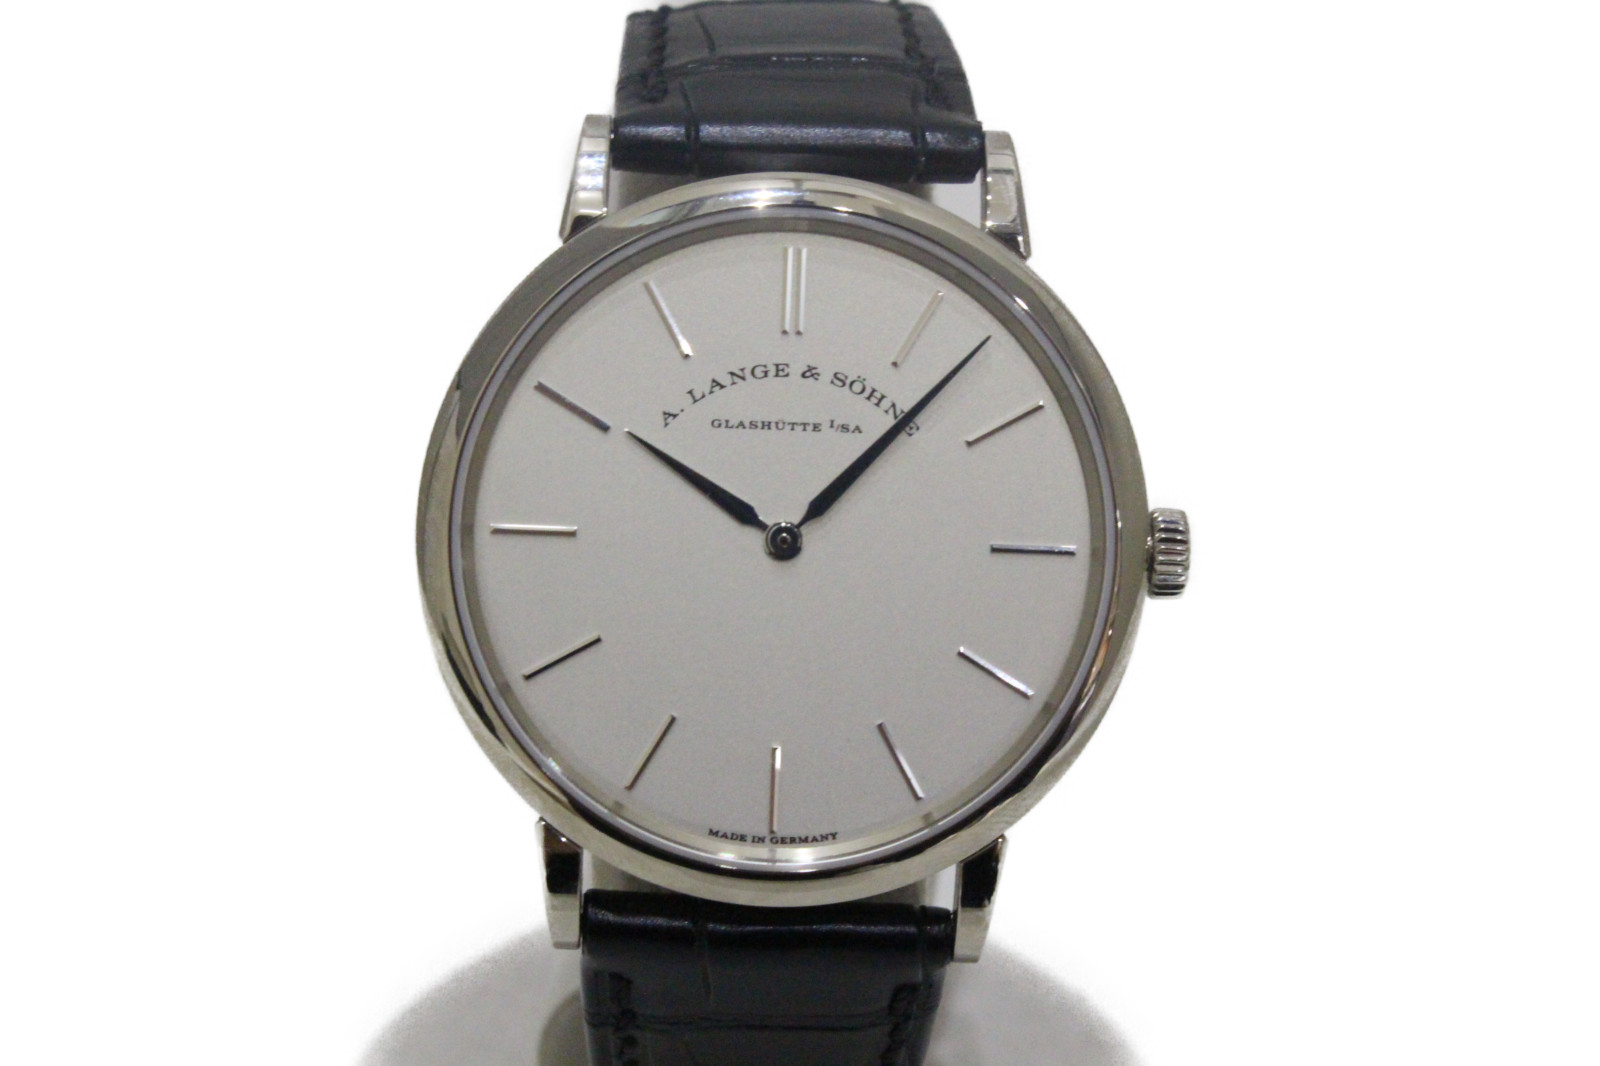 A.LANGE&SOHNE ランゲ&ゾーネ サクソニア 201.027 手巻き K18 ホワイトゴールド アリゲーターベルト ホワイト メンズ 腕時計【中古】